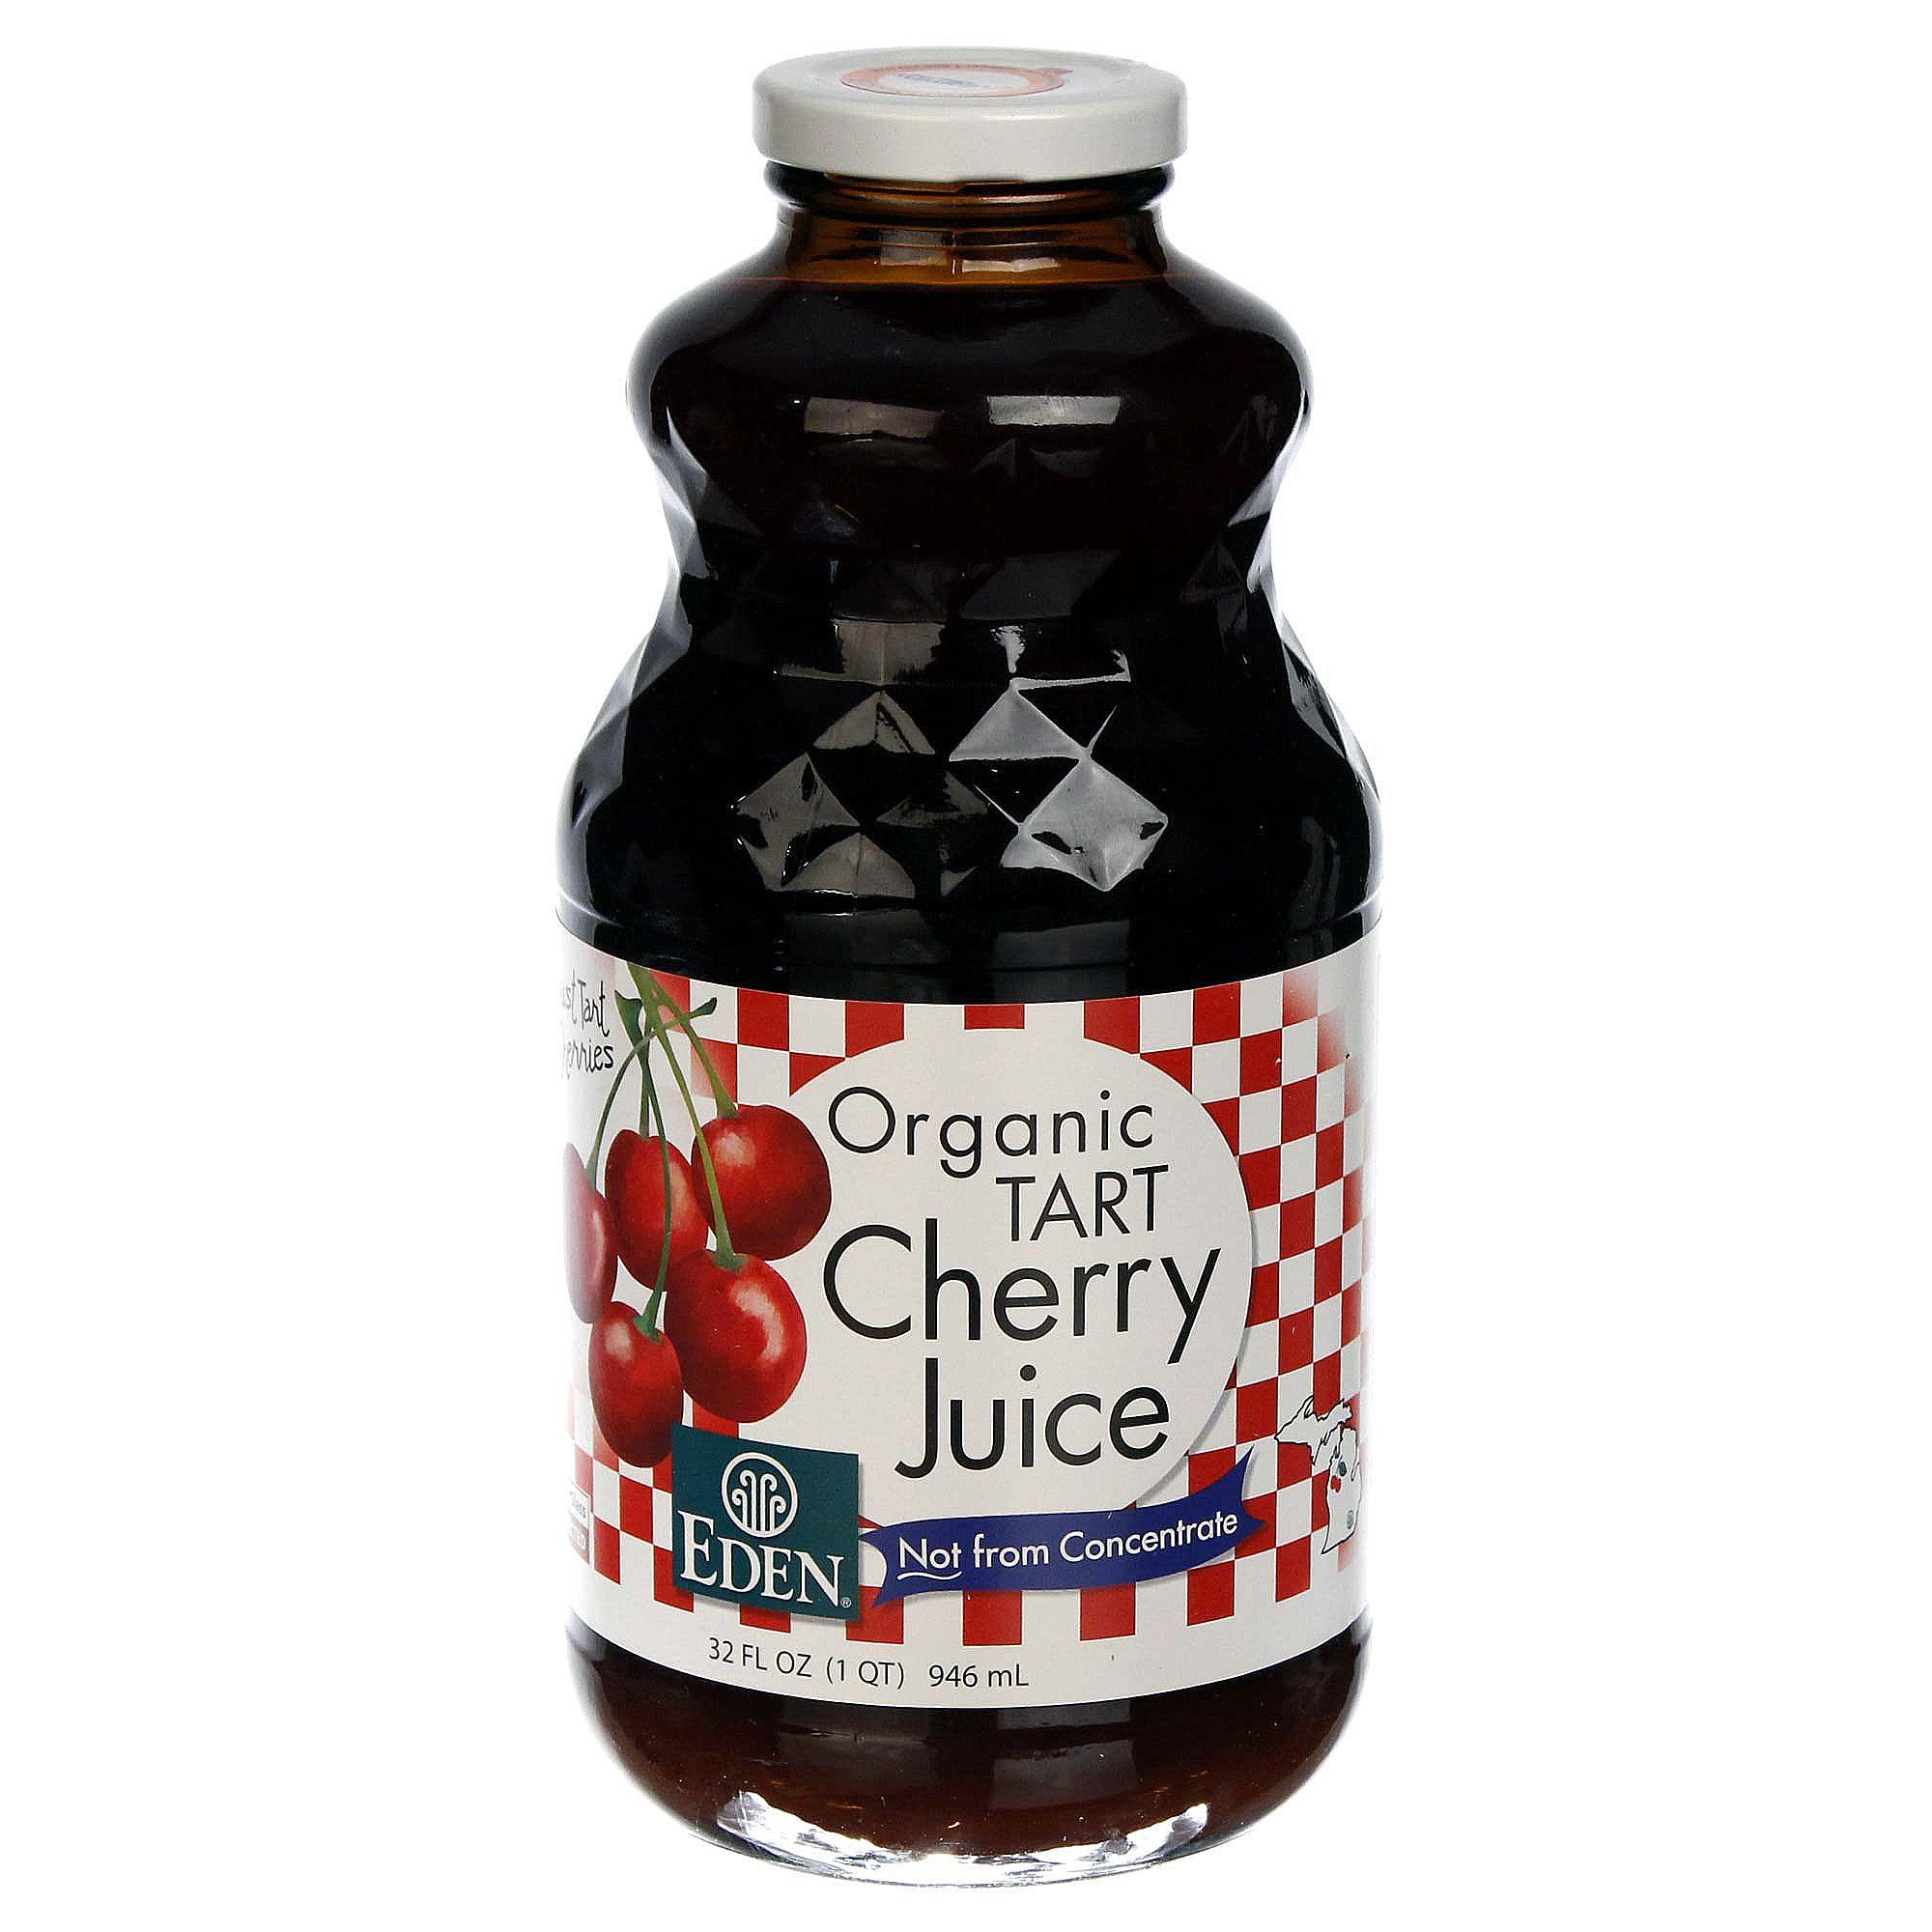 Eden Foods Organic Juice, Cherry - Tart - 32 fl oz